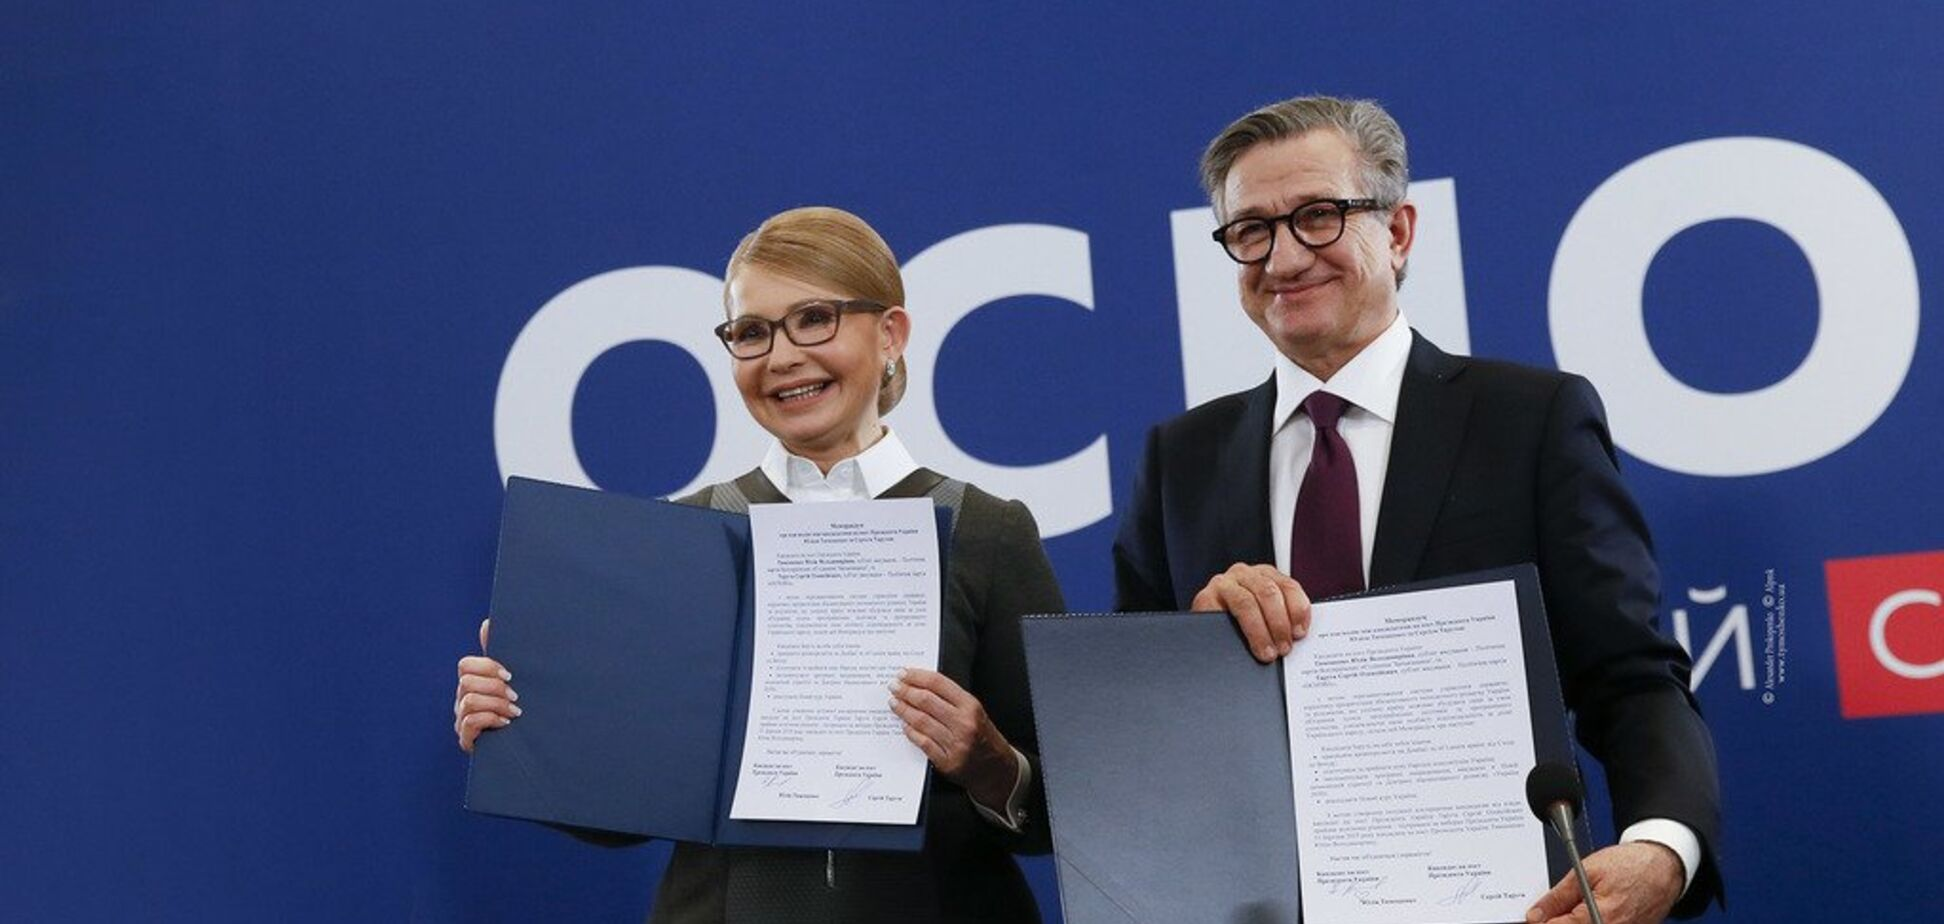 Тарута поддержал Тимошенко – кандидаты подписали Меморандум